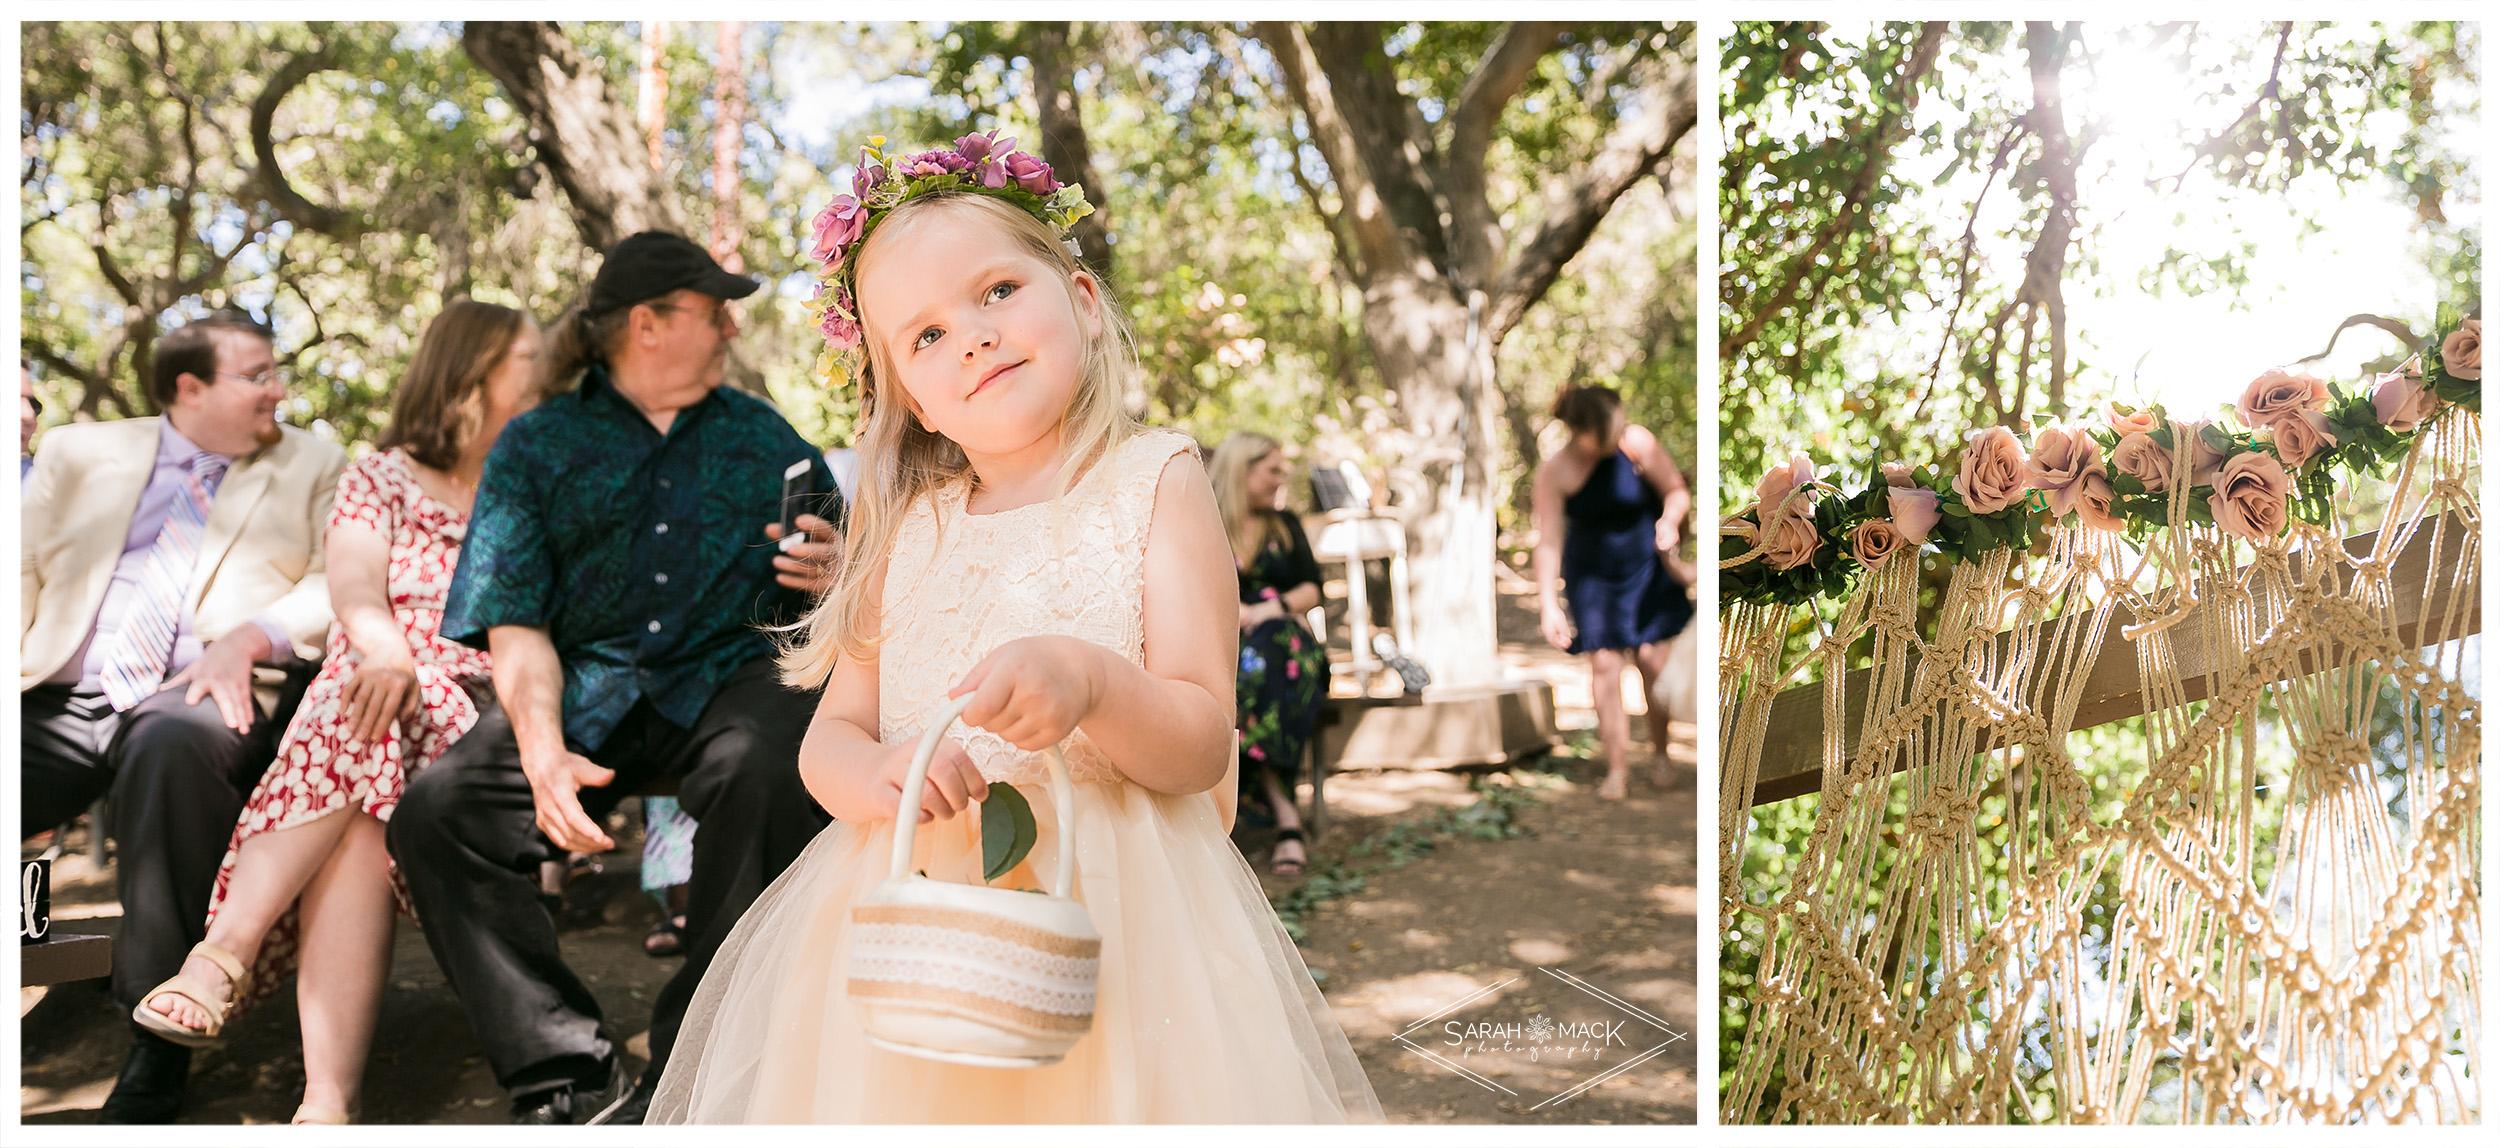 RF-Estate-on-Second-Santa-Ana-Wedding-Photography-28.jpg